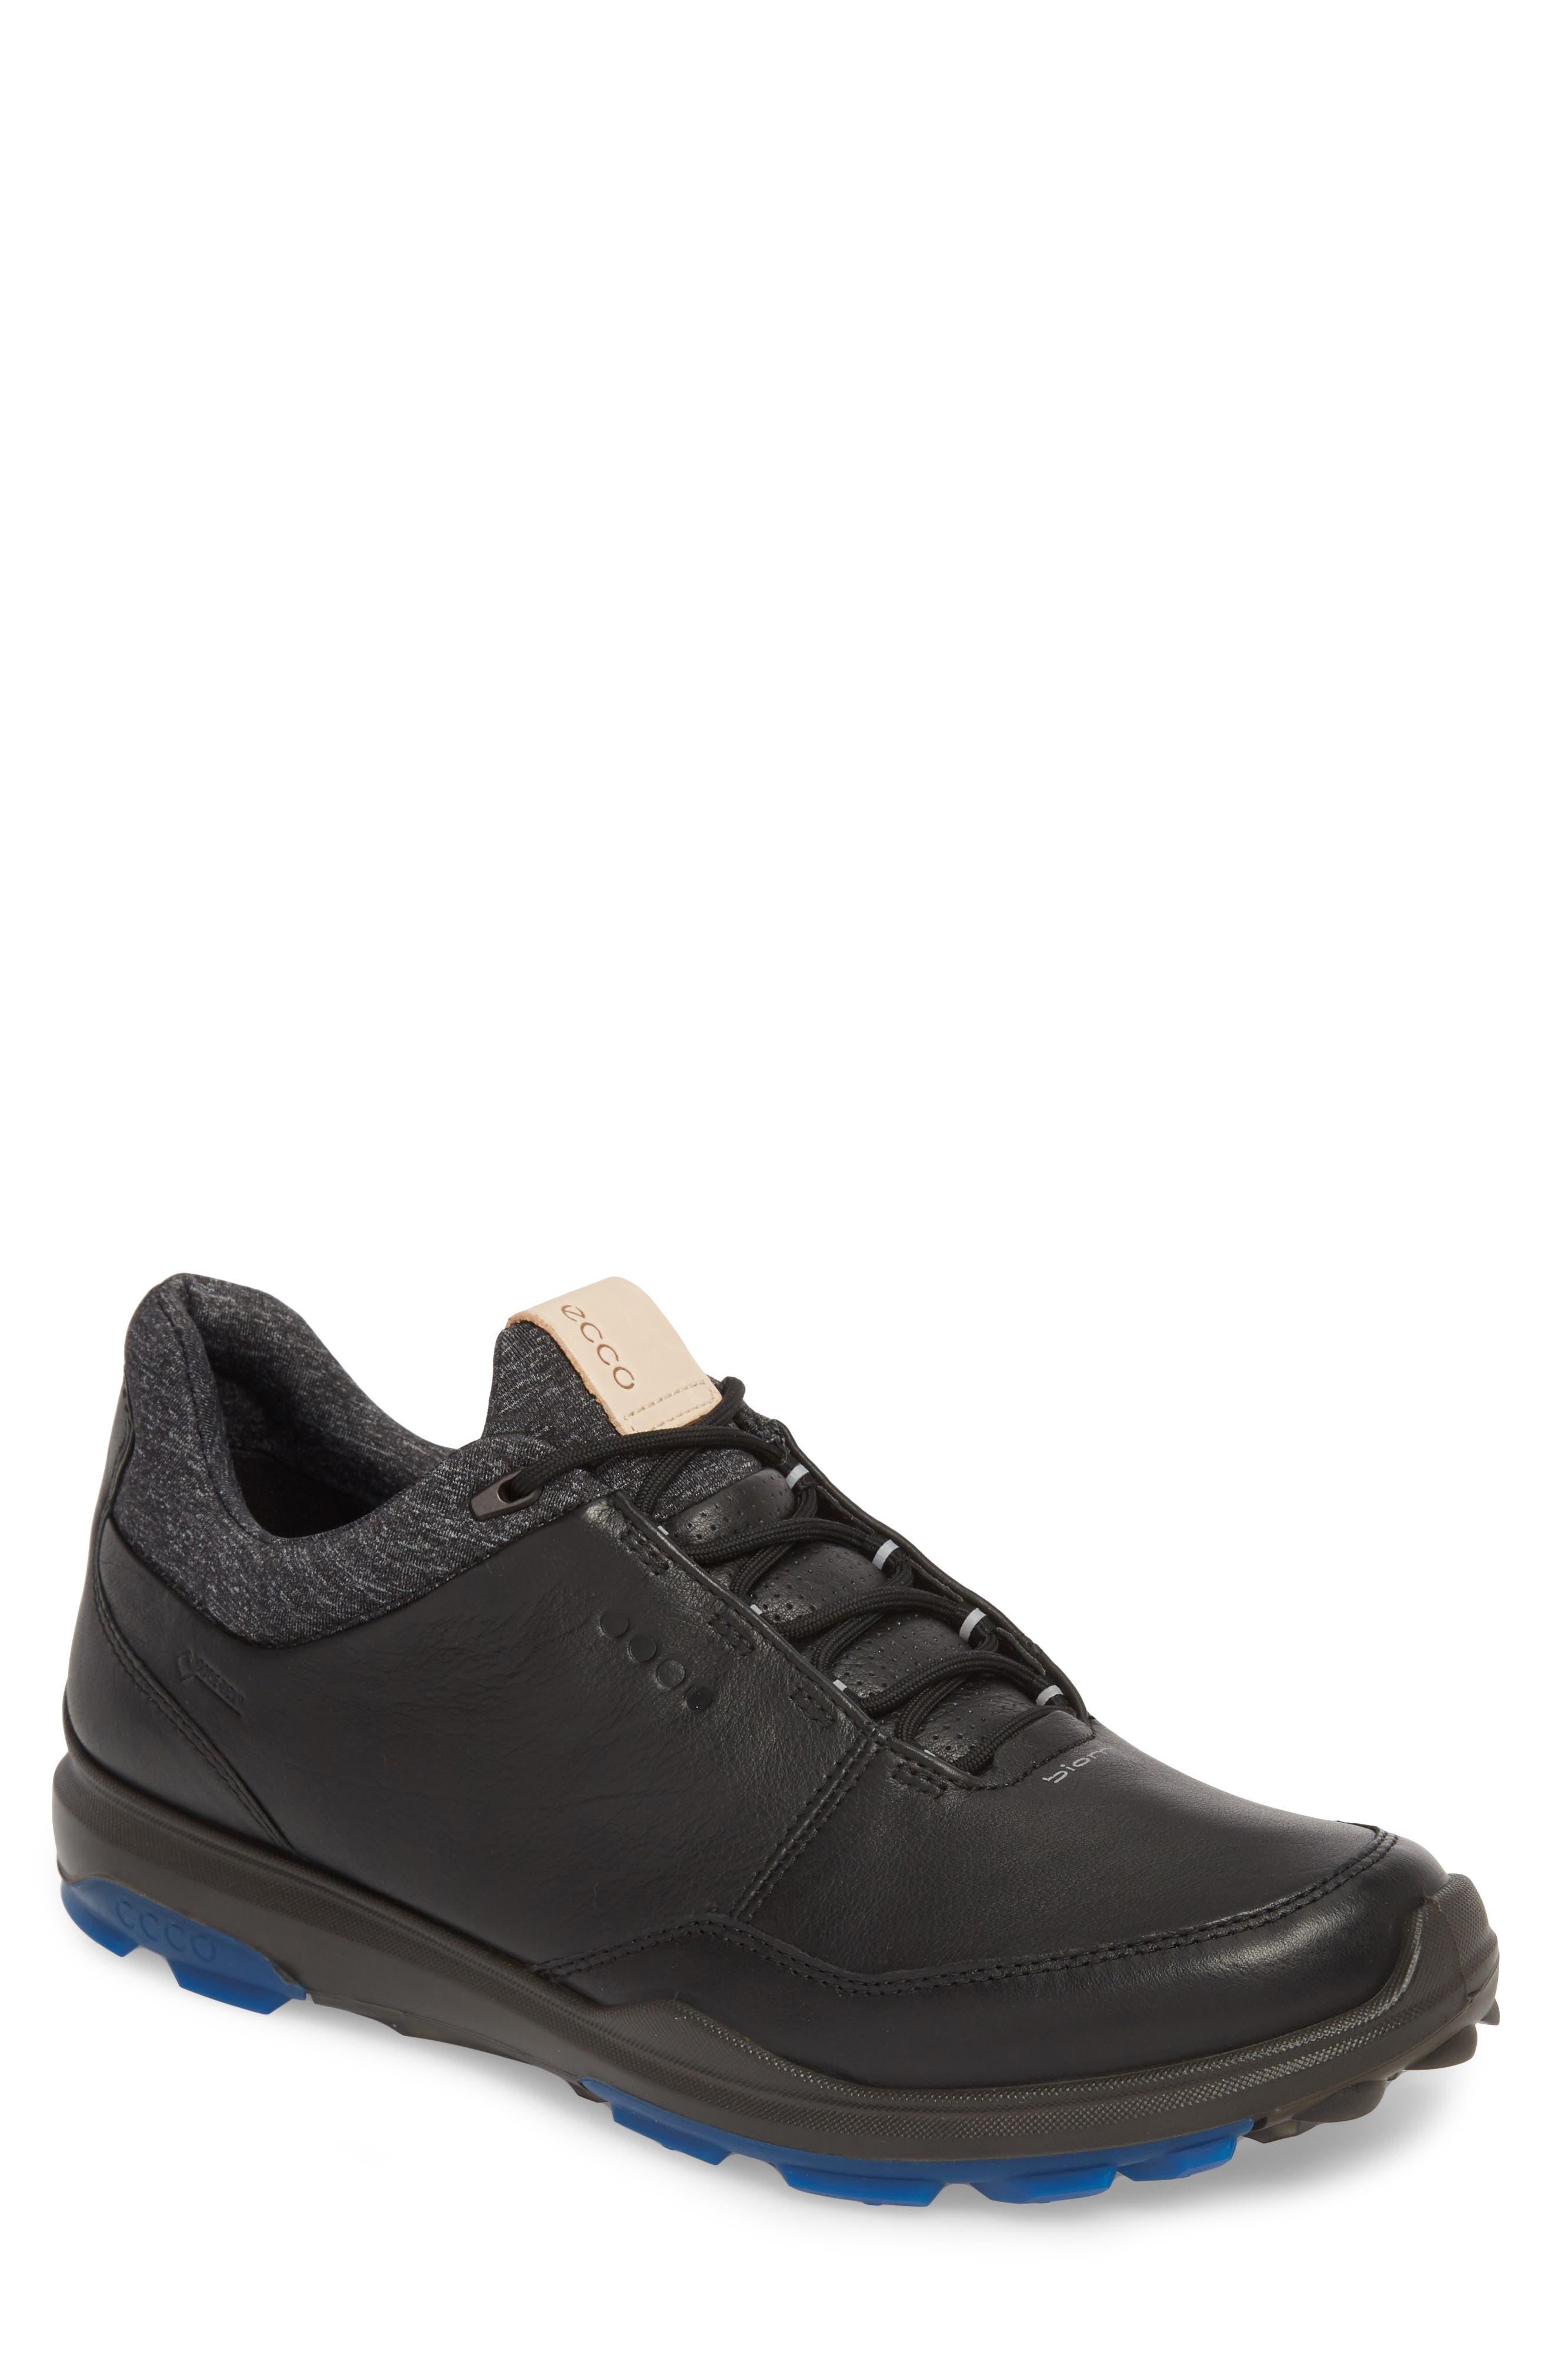 ECCO BIOM Hybrid 3 Gore-Tex<sup>®</sup> Golf Shoe, Main, color, BLACK/ BERMUDA BLUE LEATHER